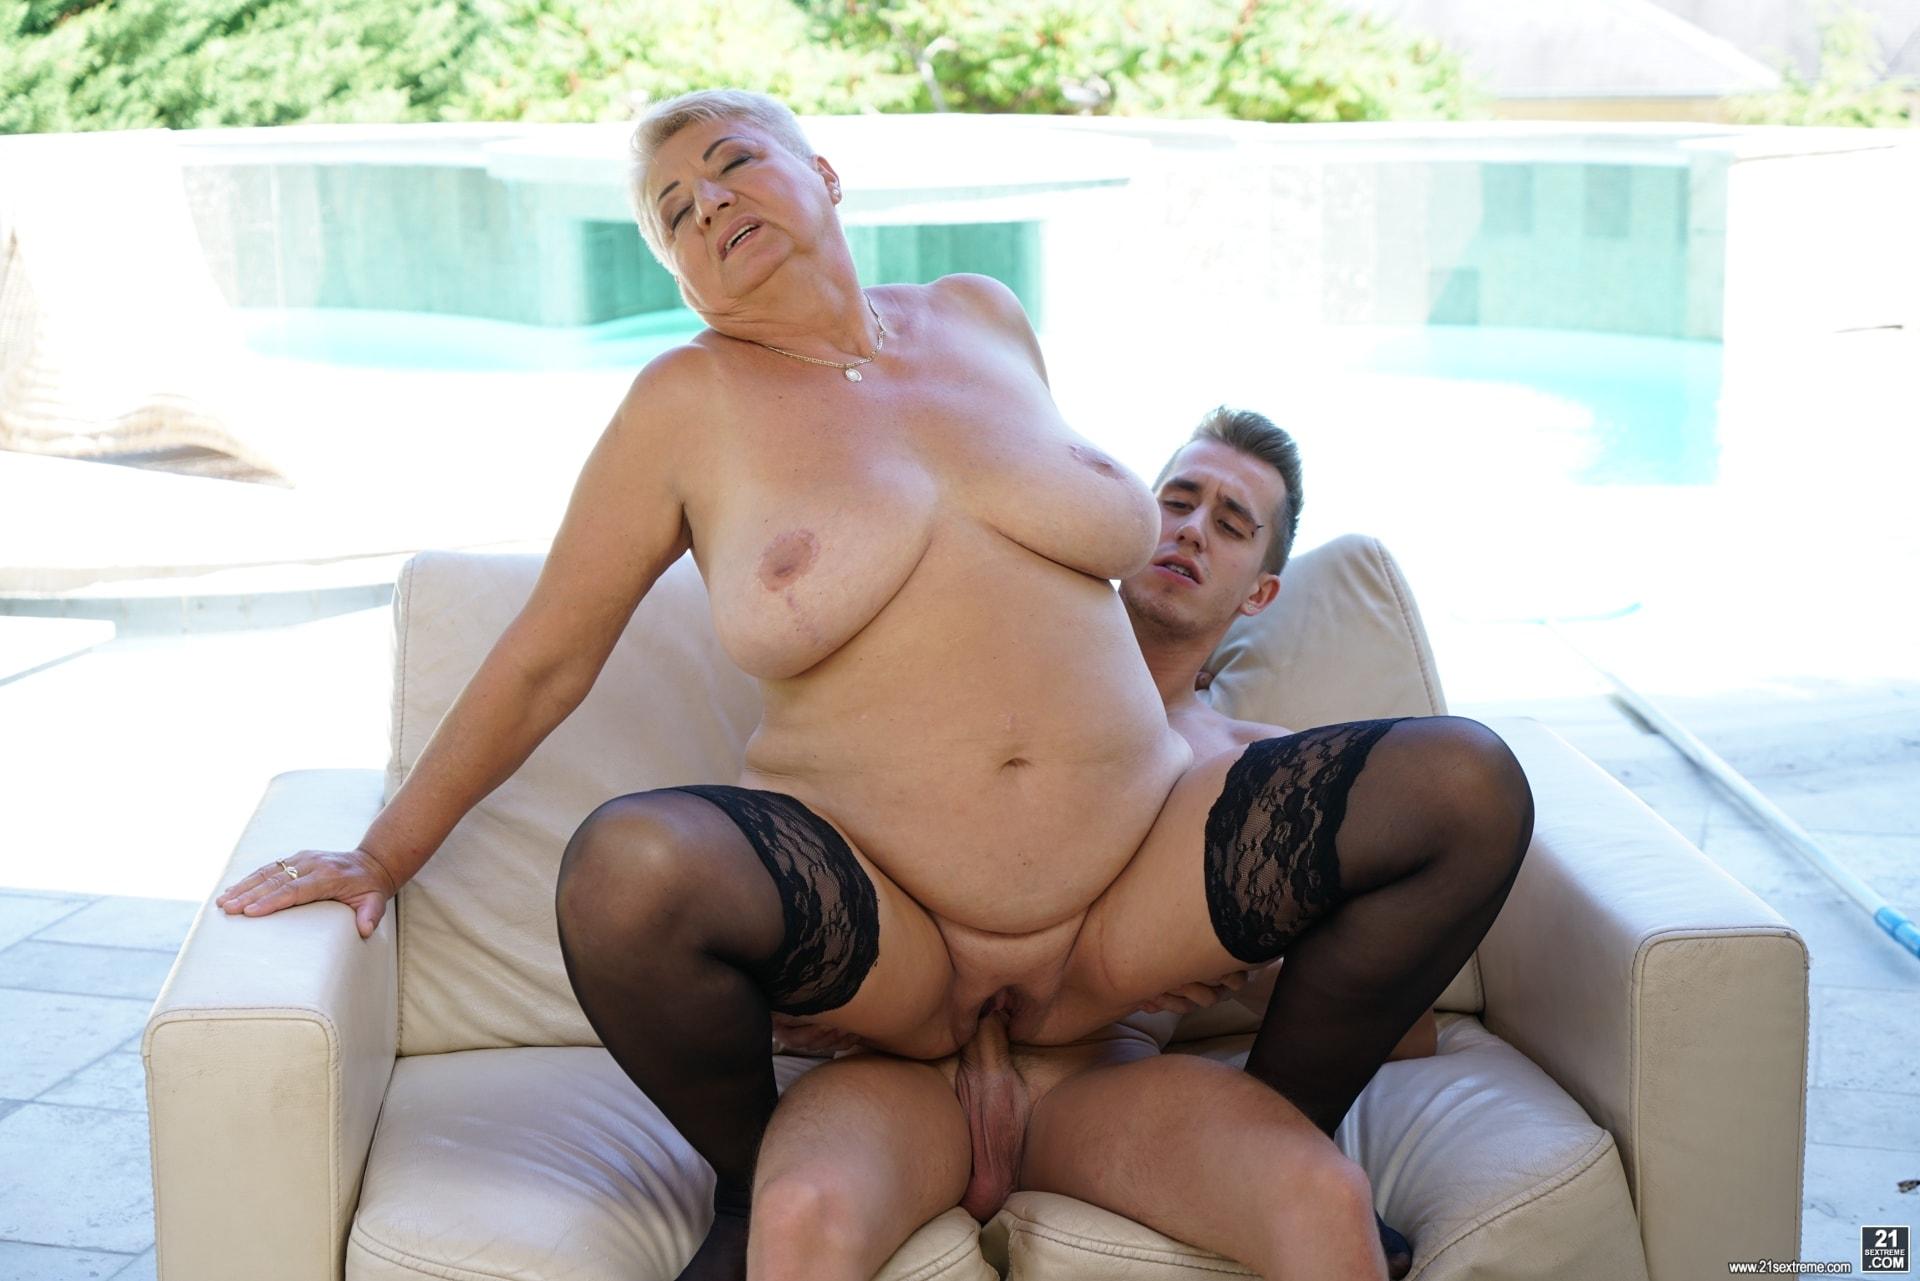 21Sextury 'Lusty Granny's Poolside Fuck' starring Astrid (Photo 144)